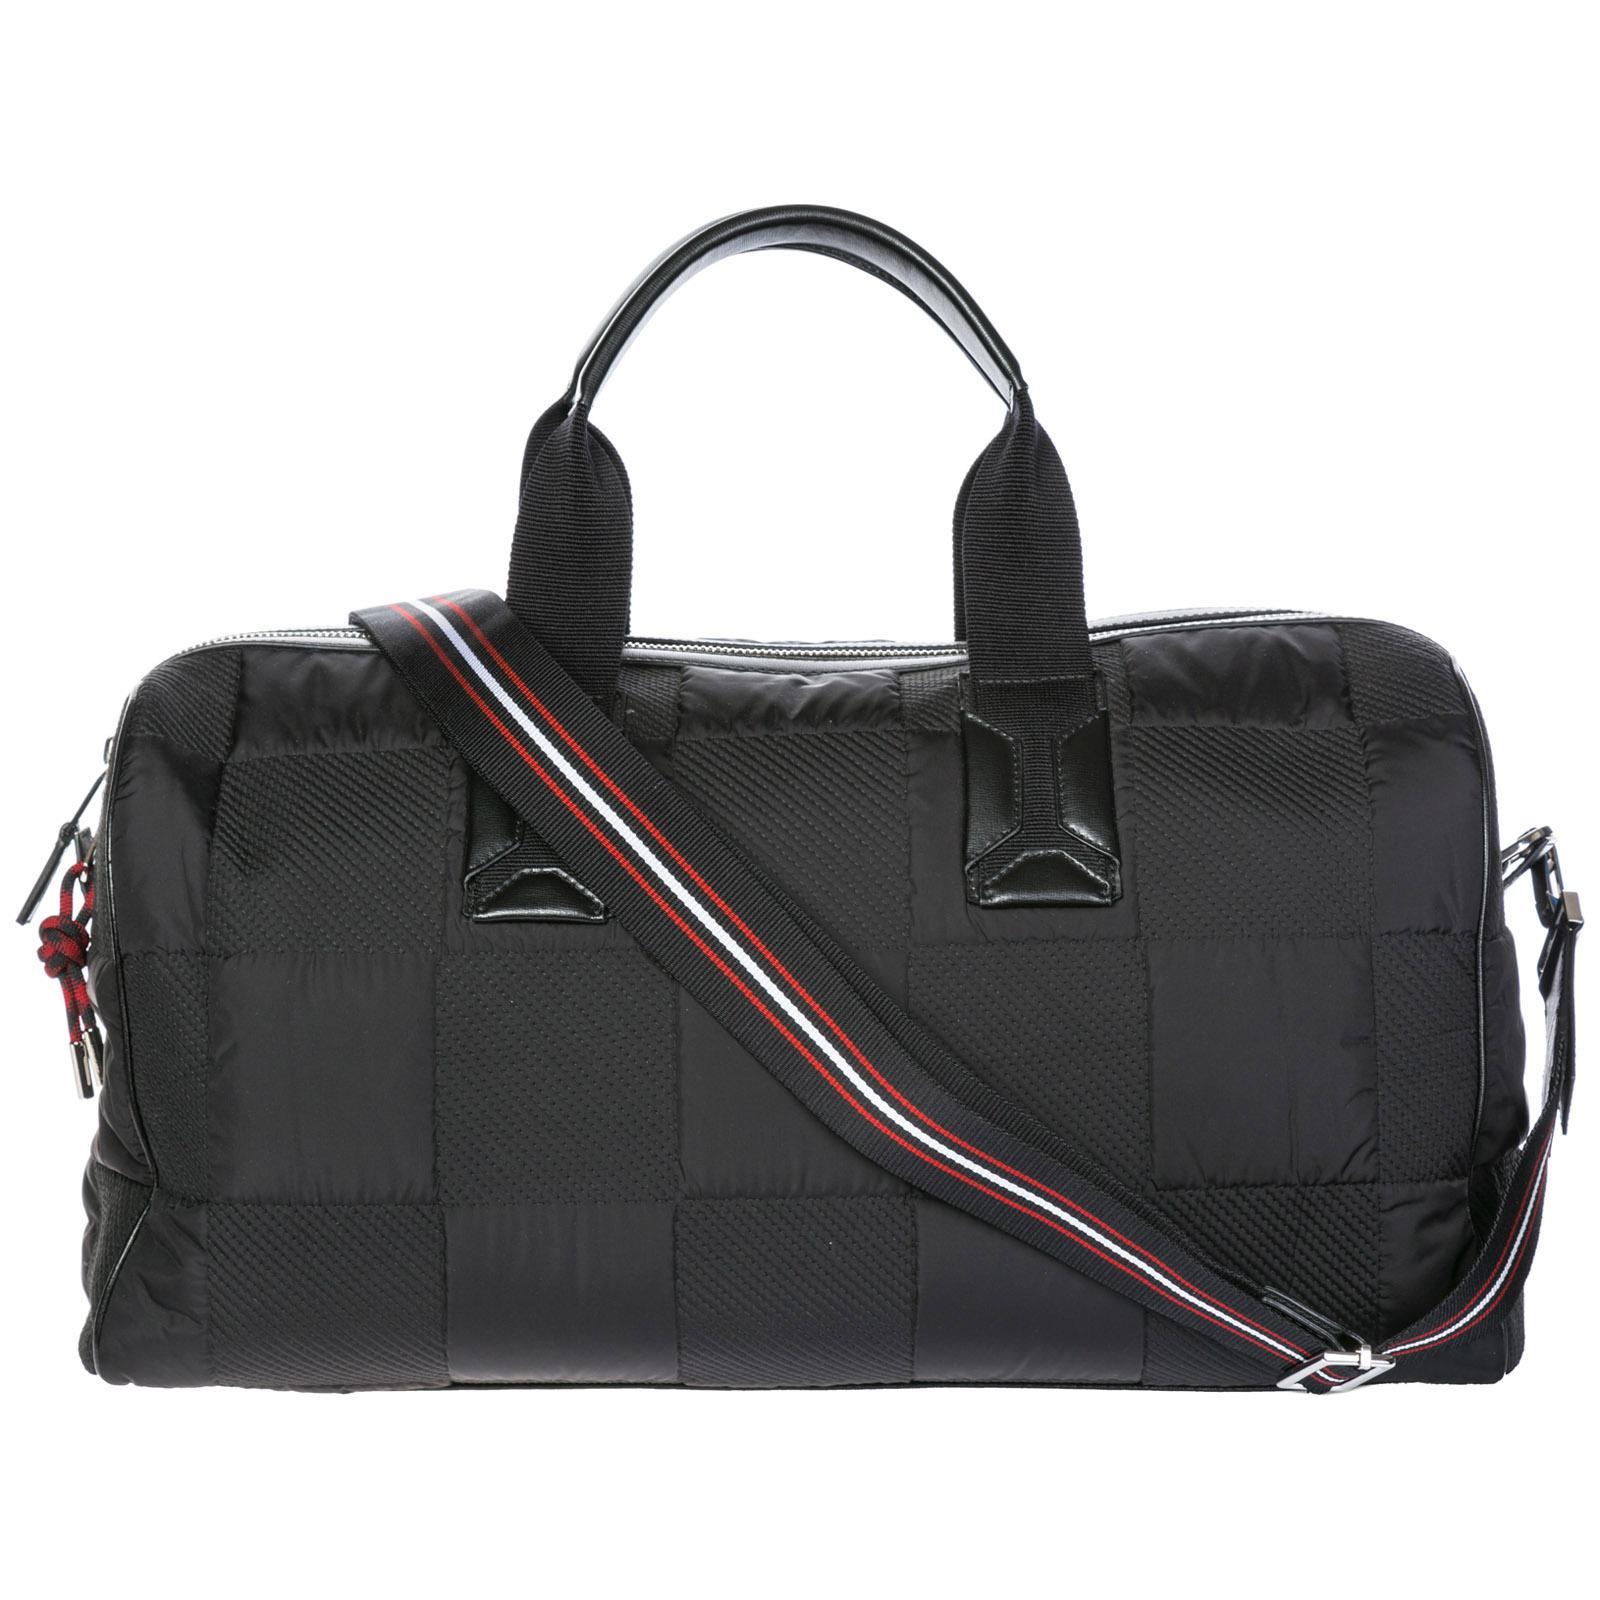 ... Travel Duffle Weekend Shoulder Bag Nylon for Men - Lyst. View fullscreen 799fc0d1fe2a0